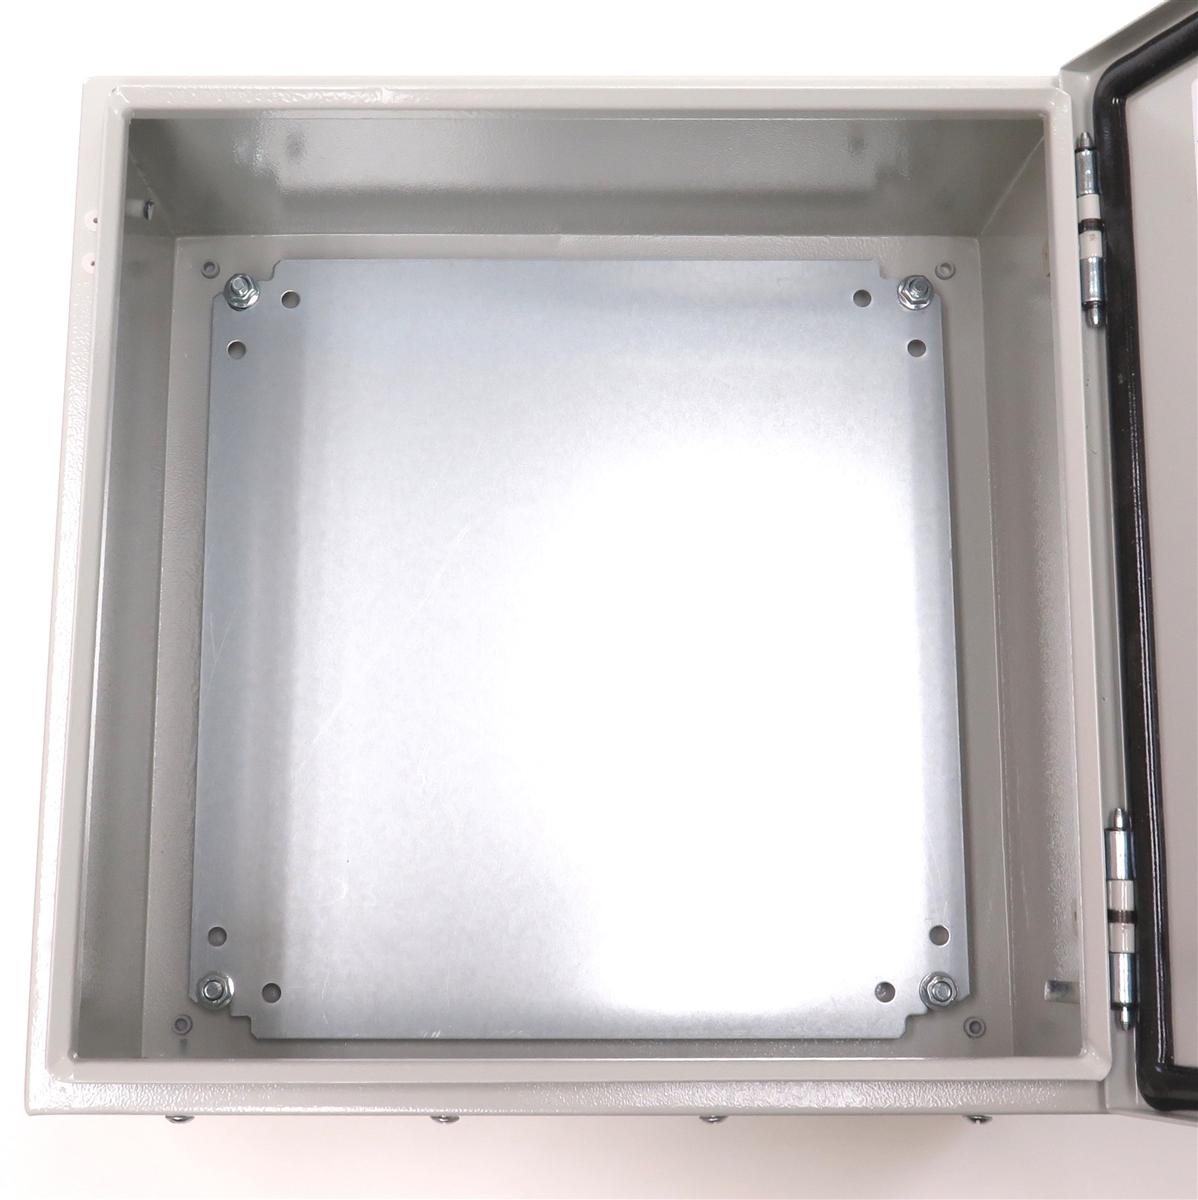 Yuco Fully Enclosed Nema Type 4 UL Enclosure Wall Mount Galvanized Back Plate